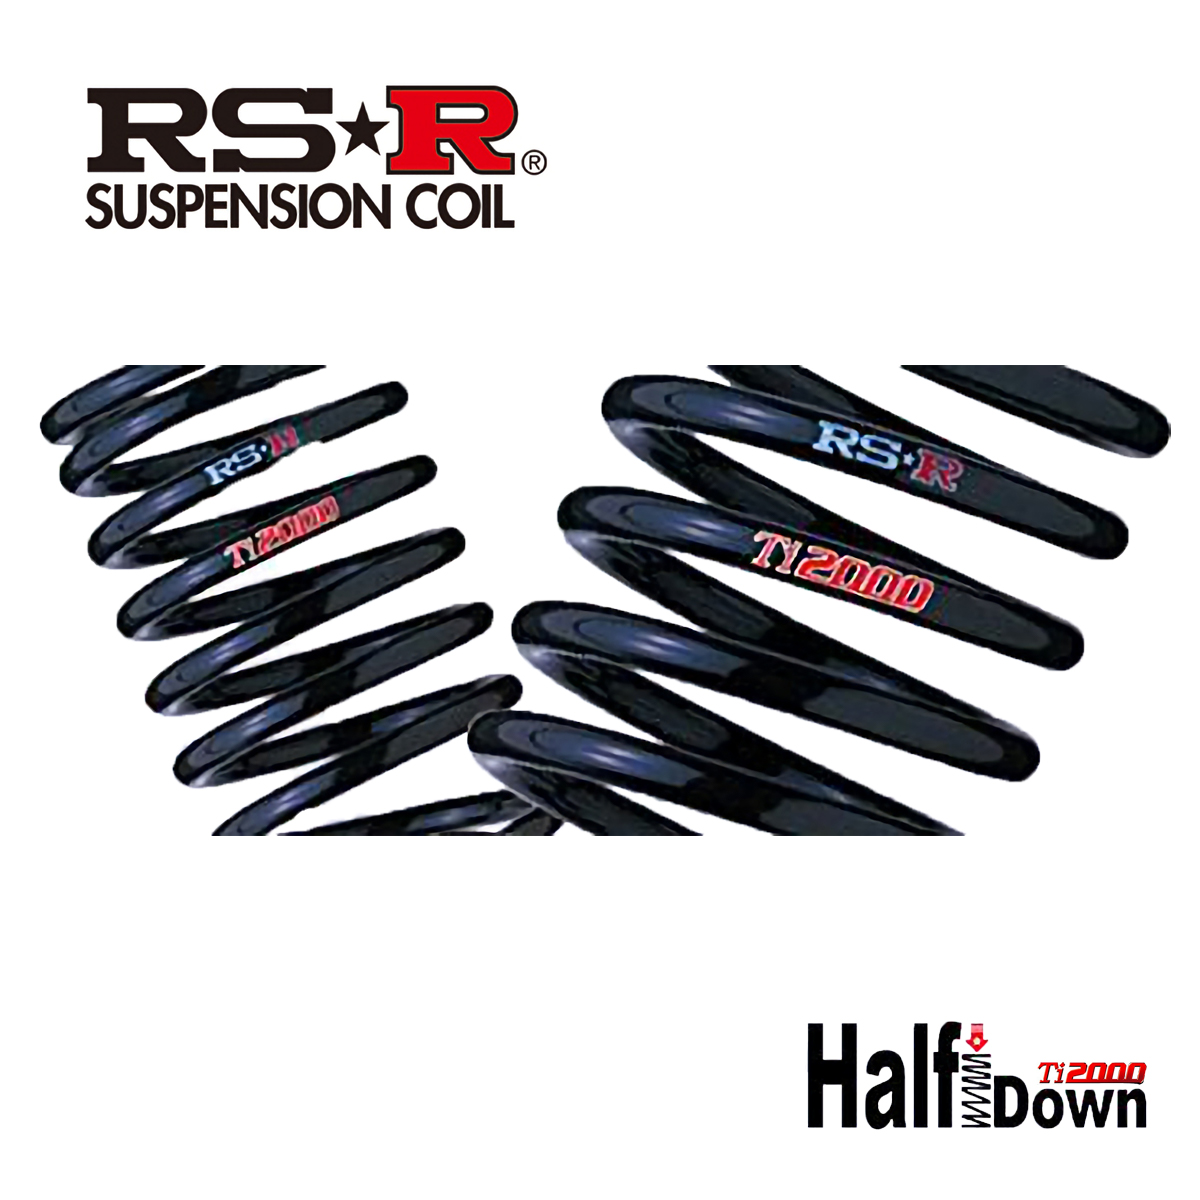 RS-R エスクァイア 4WD ZWR80G ダウンサス スプリング フロントのみ T935TWF Ti2000 ダウン RSR 個人宅発送追金有